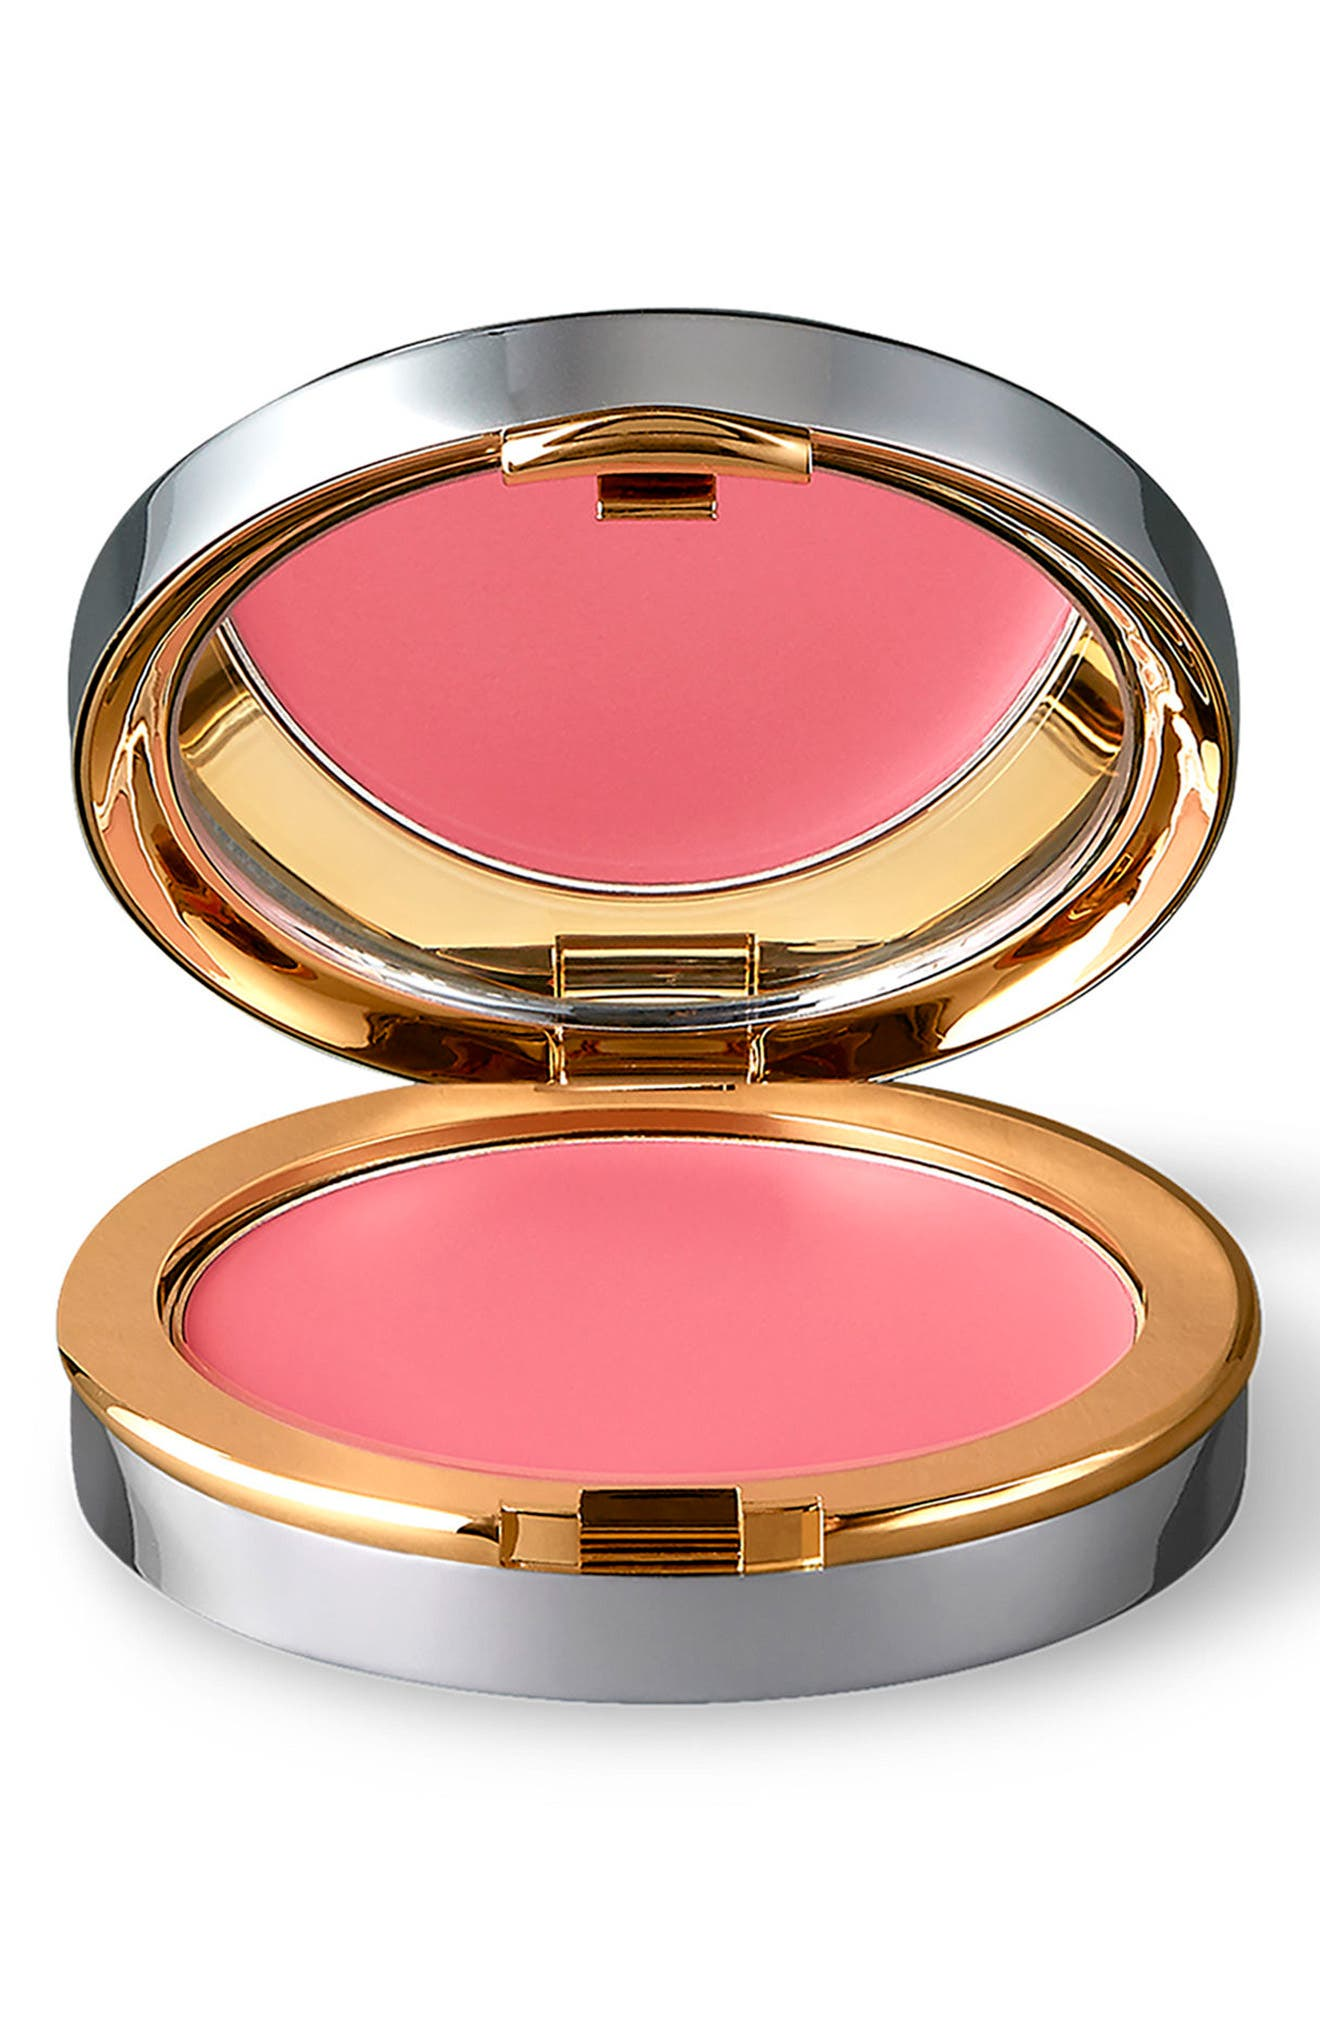 Main Image - La Prairie Cellular Radiance Cream Blush